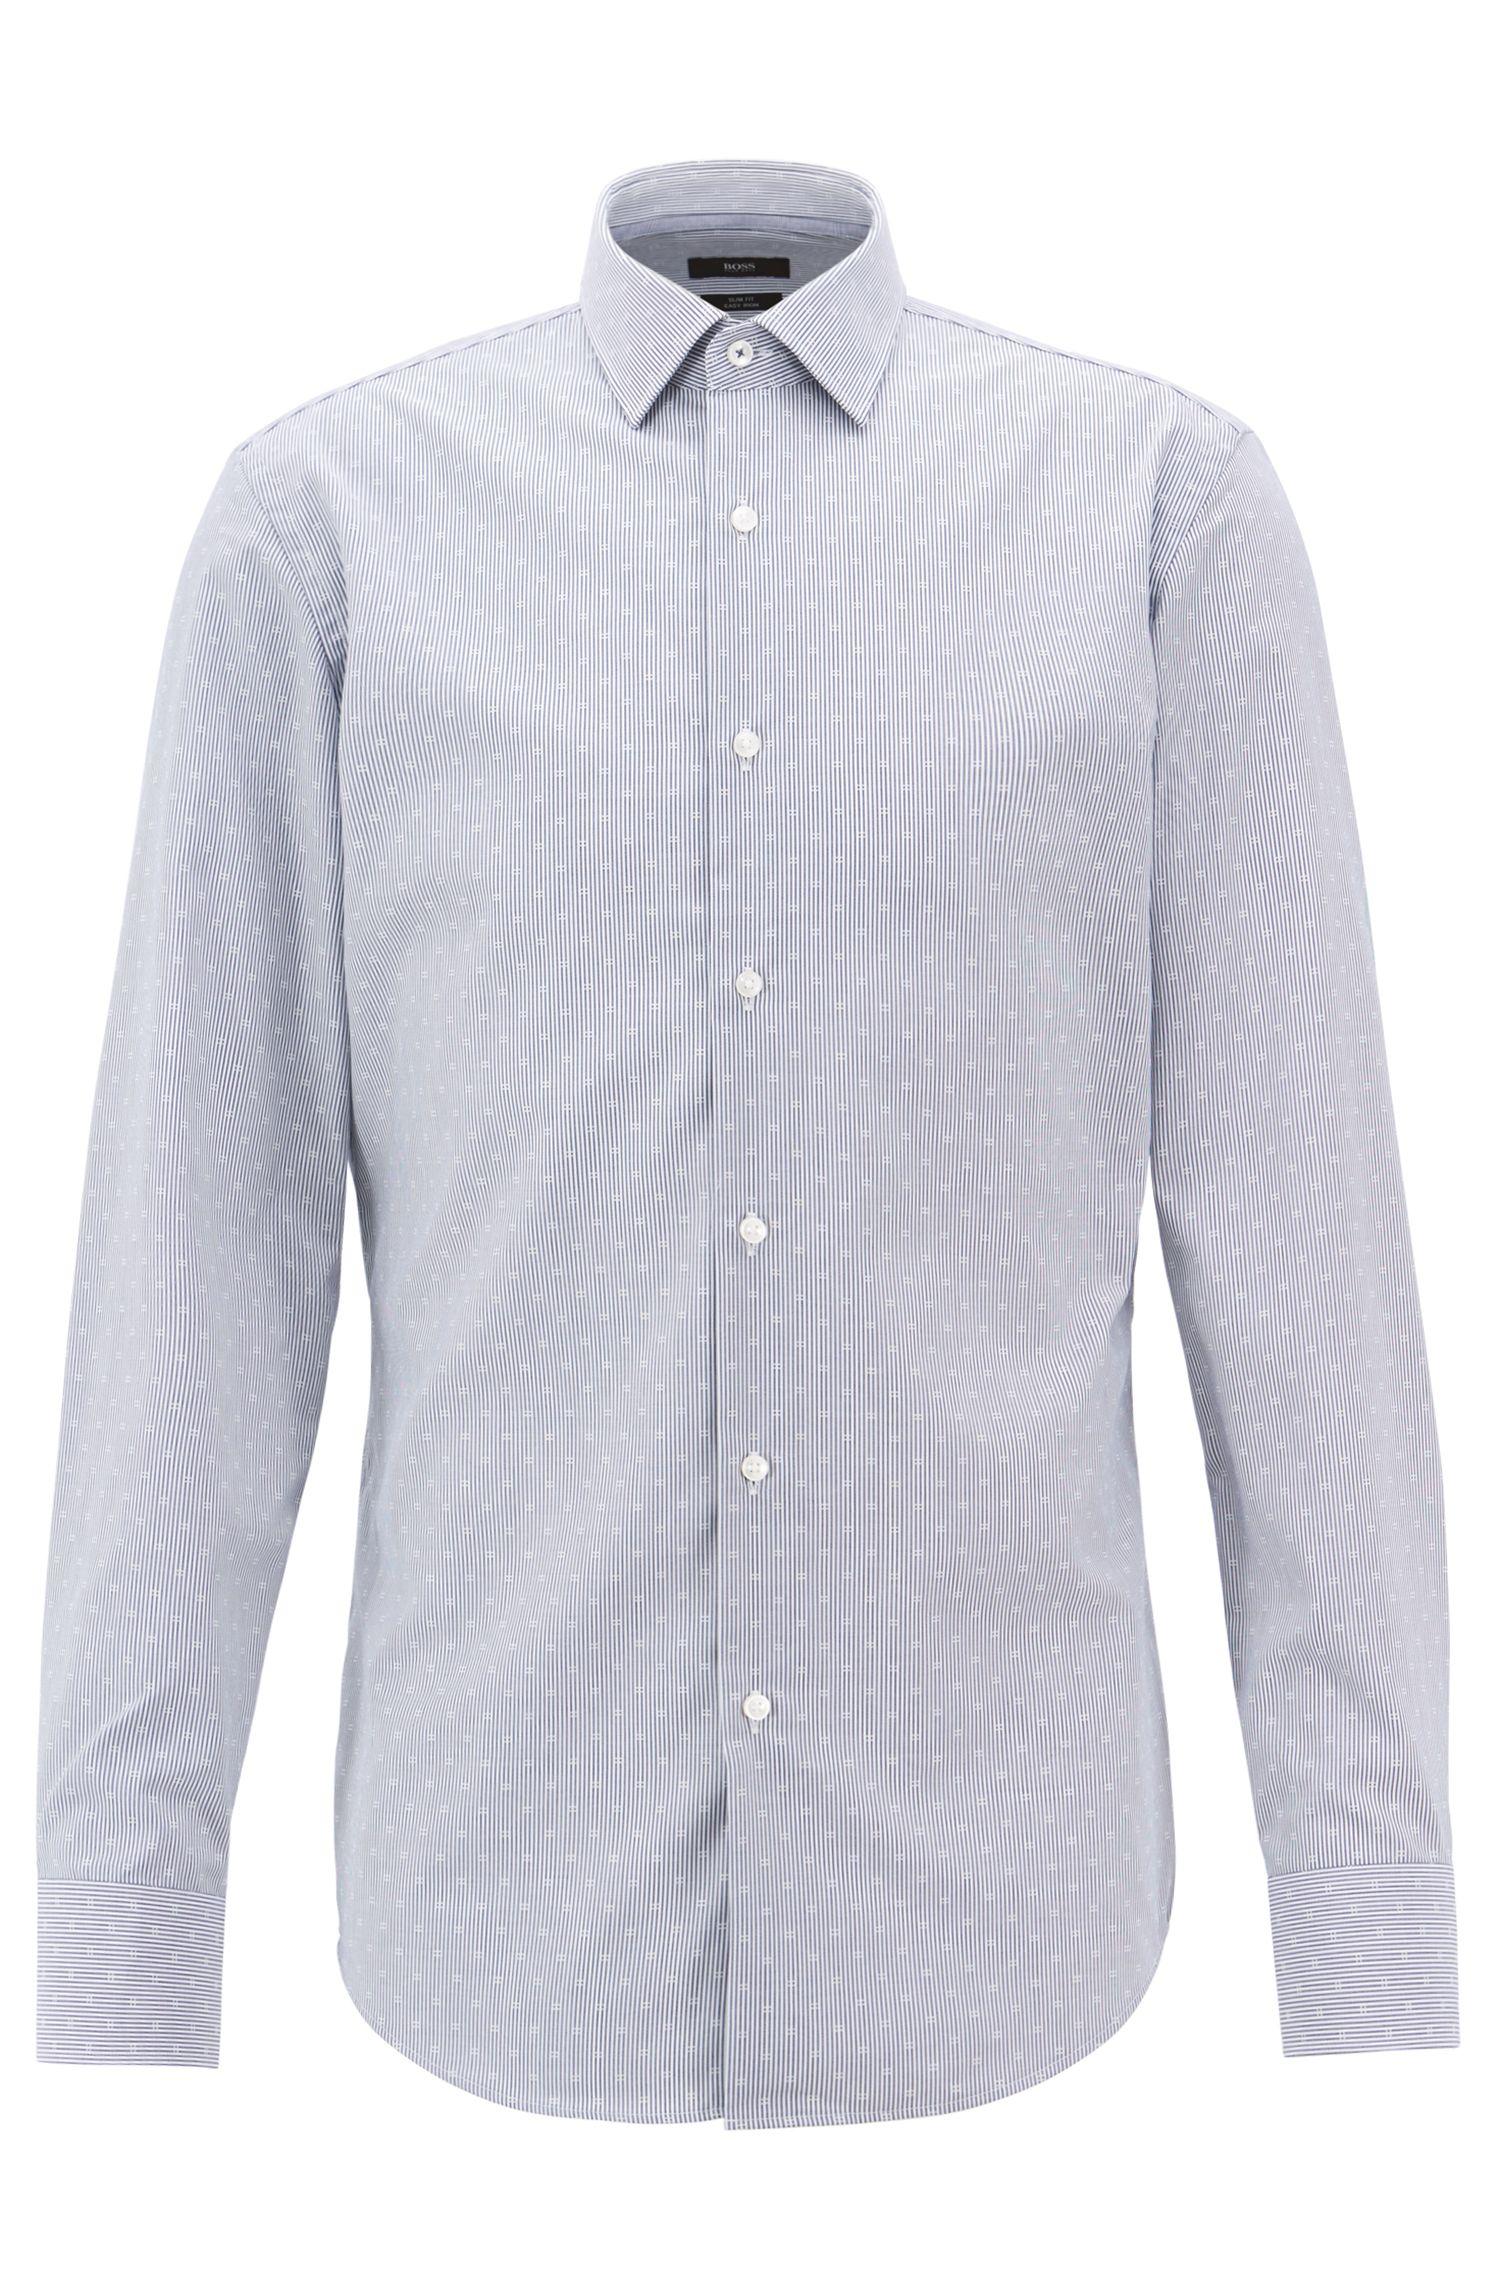 Easy-iron slim-fit shirt in striped dobby cotton, Dark Blue